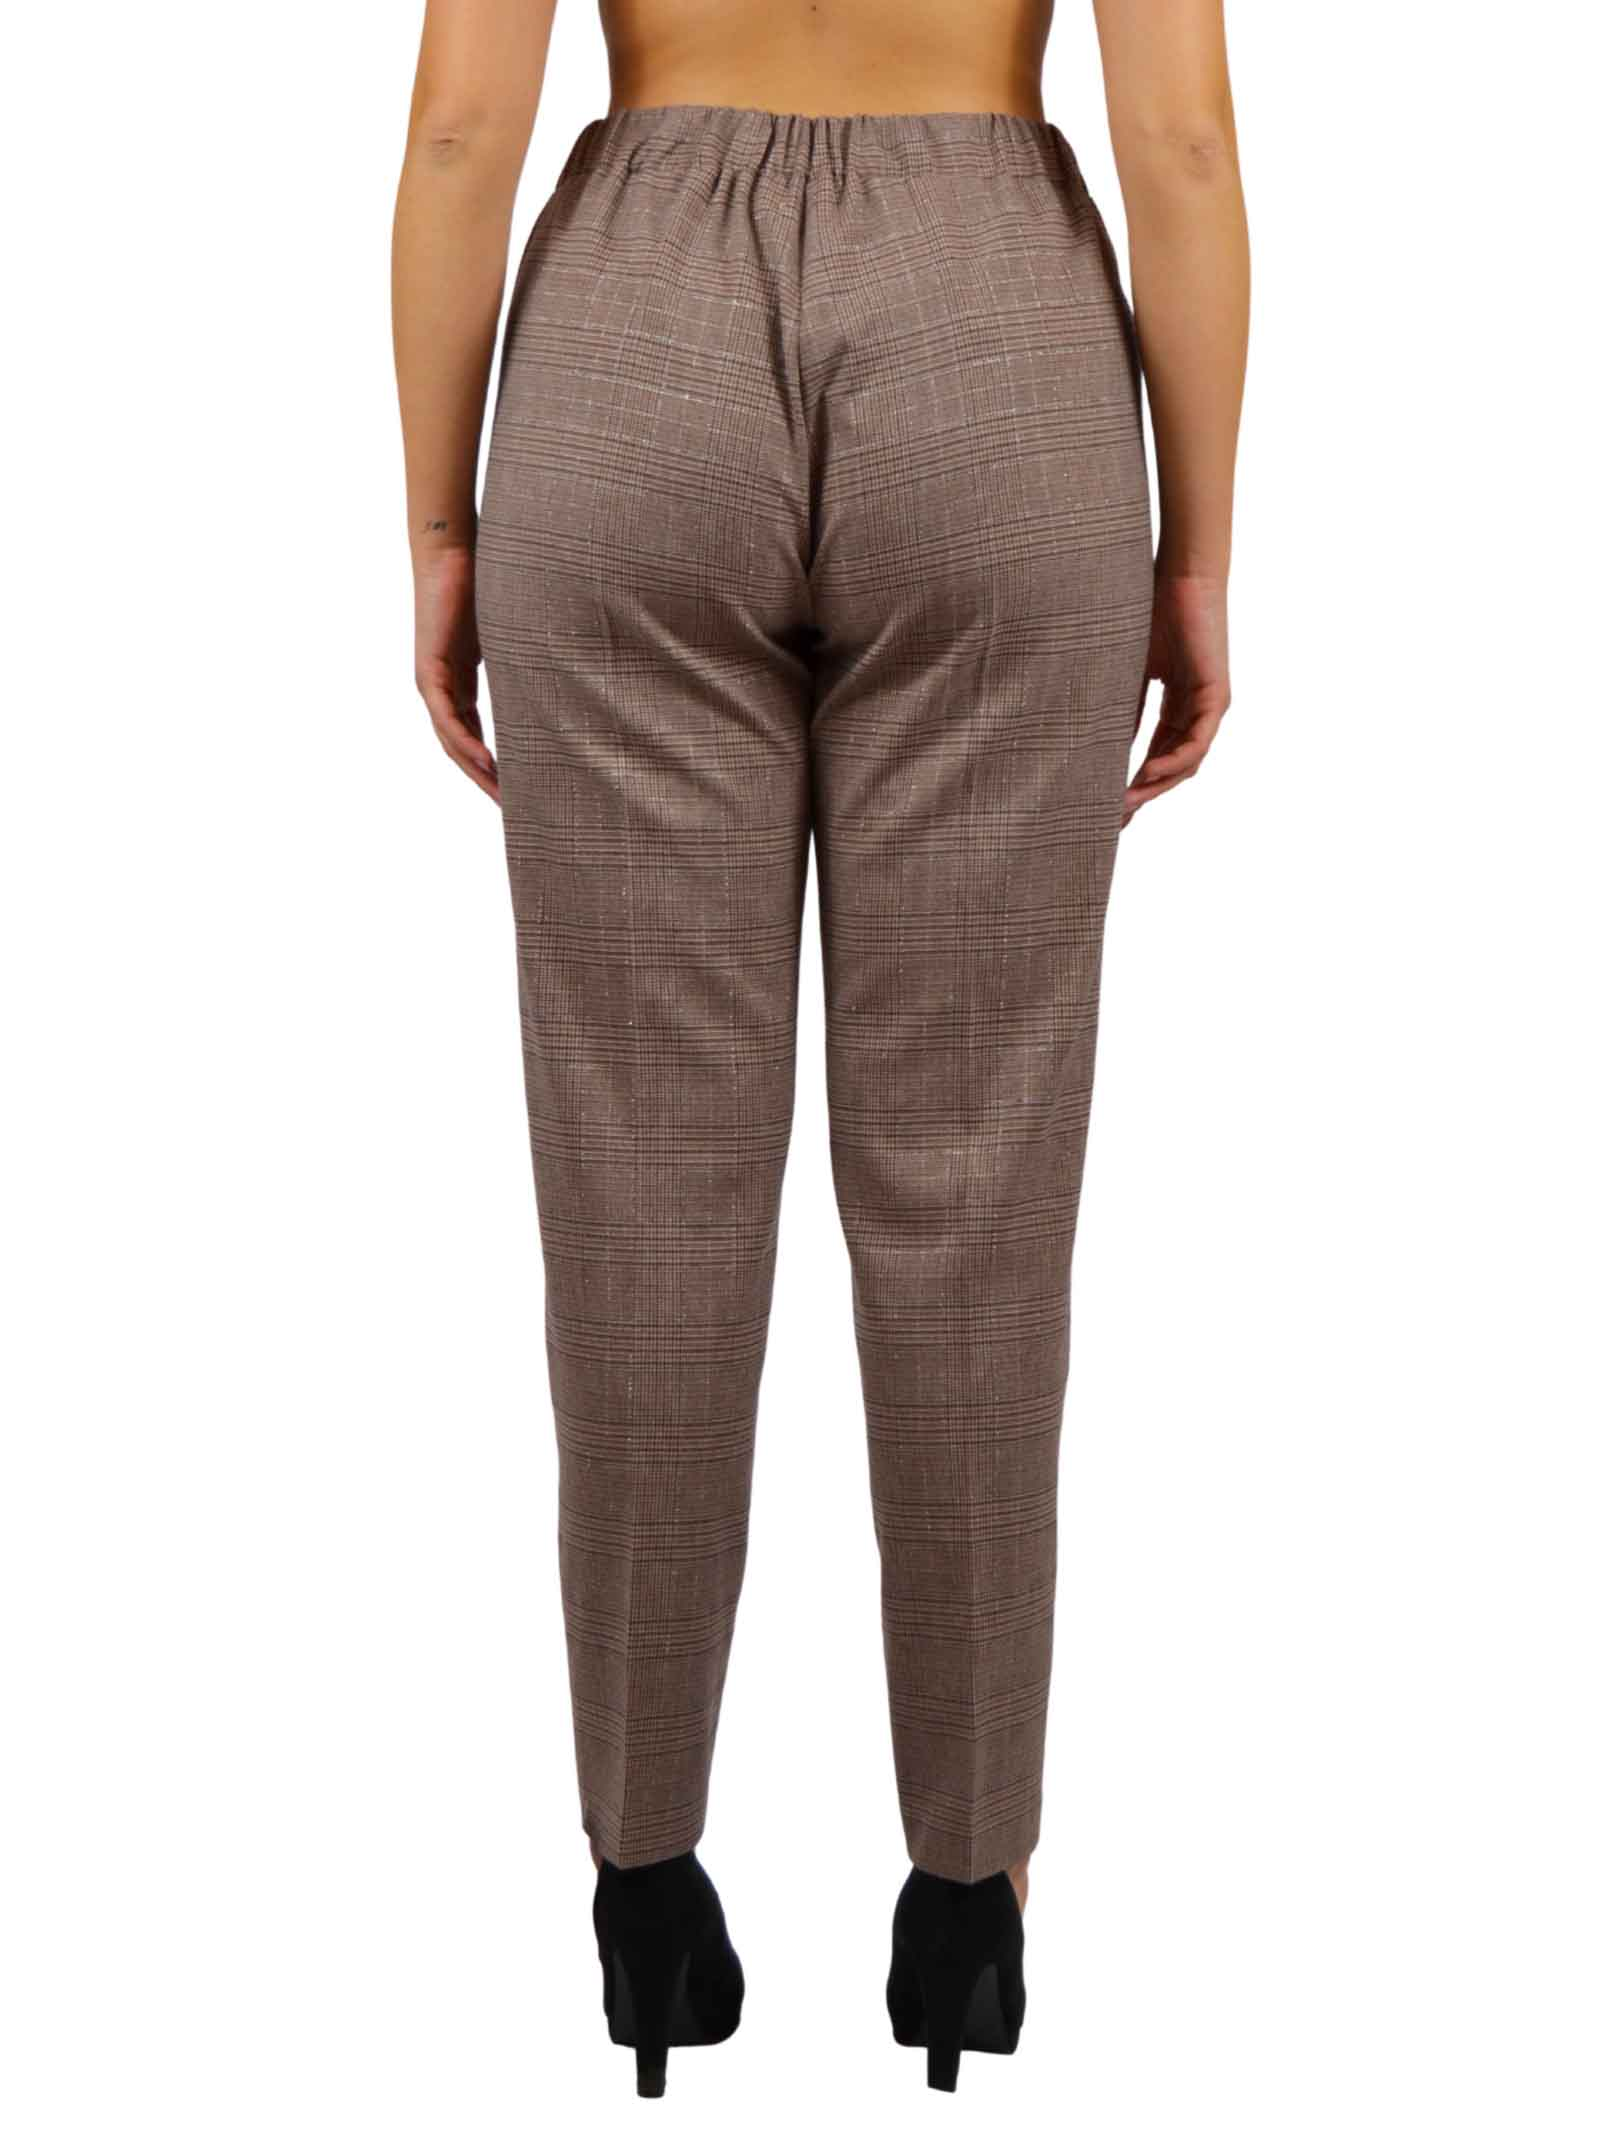 Trousers with elastic Waist America cut pockets prince of wales pattern  BENEDETTA VALERI |  | SATURNIOSUSHY